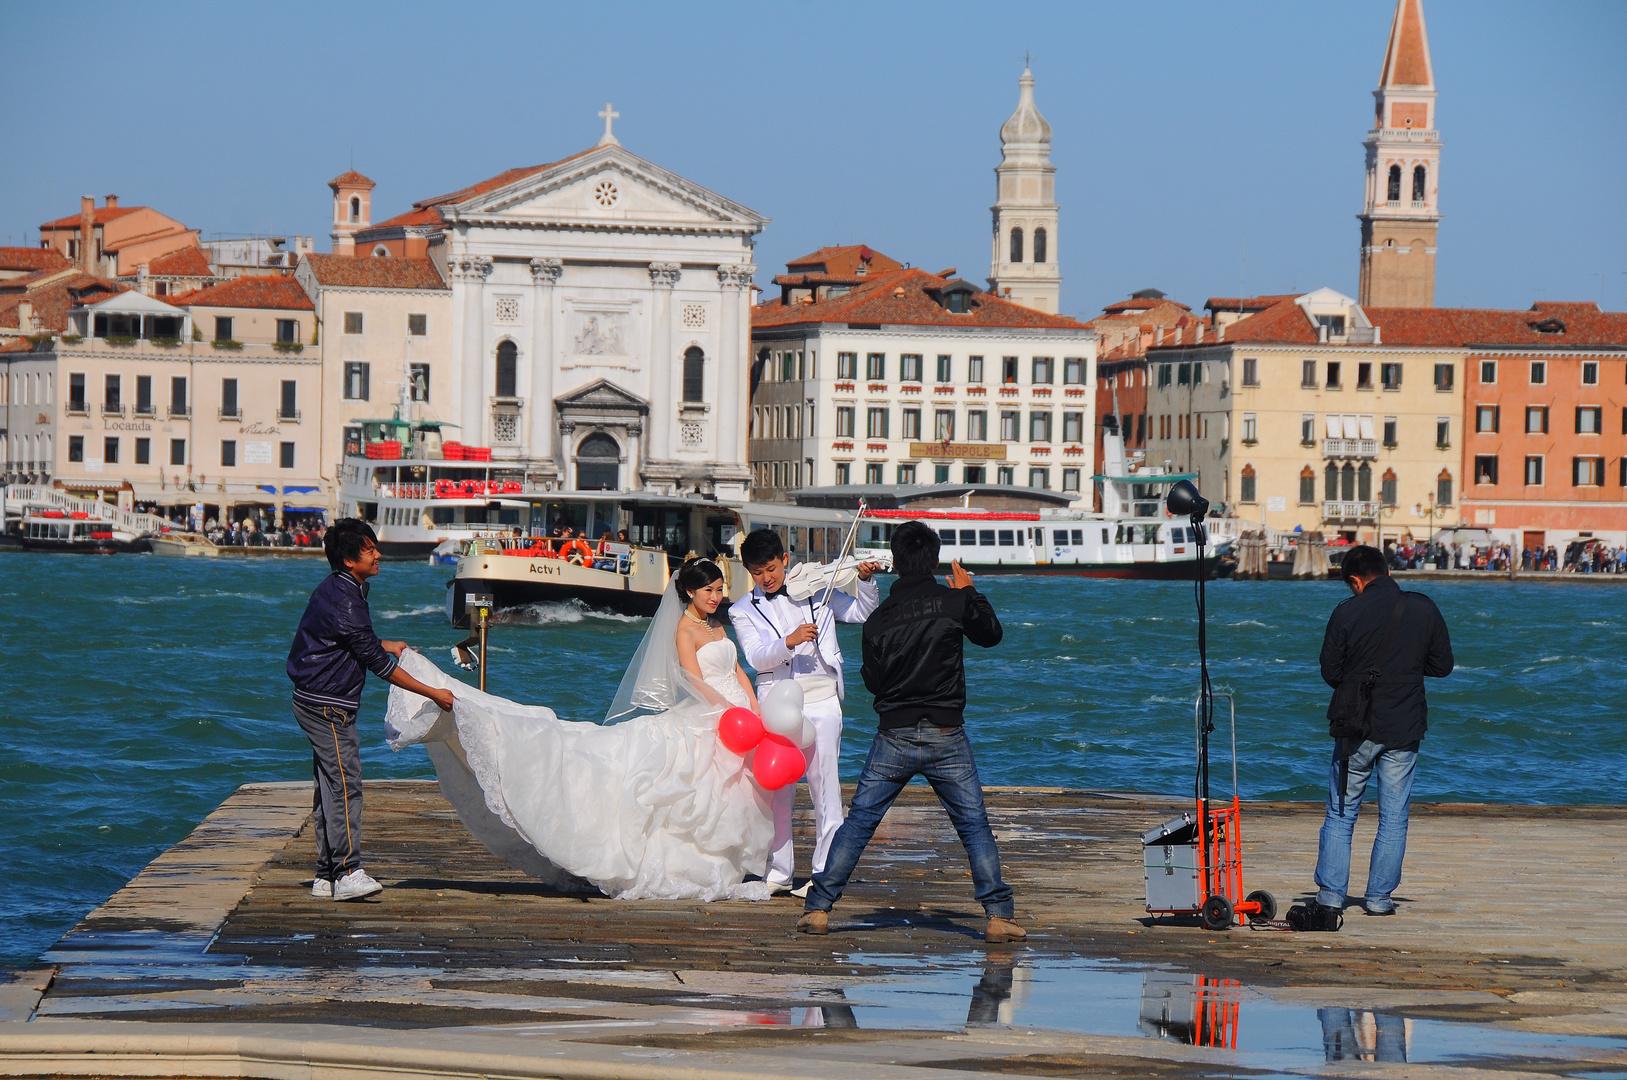 Venedig - Fotoshooting auf San Giorgio Maggiore